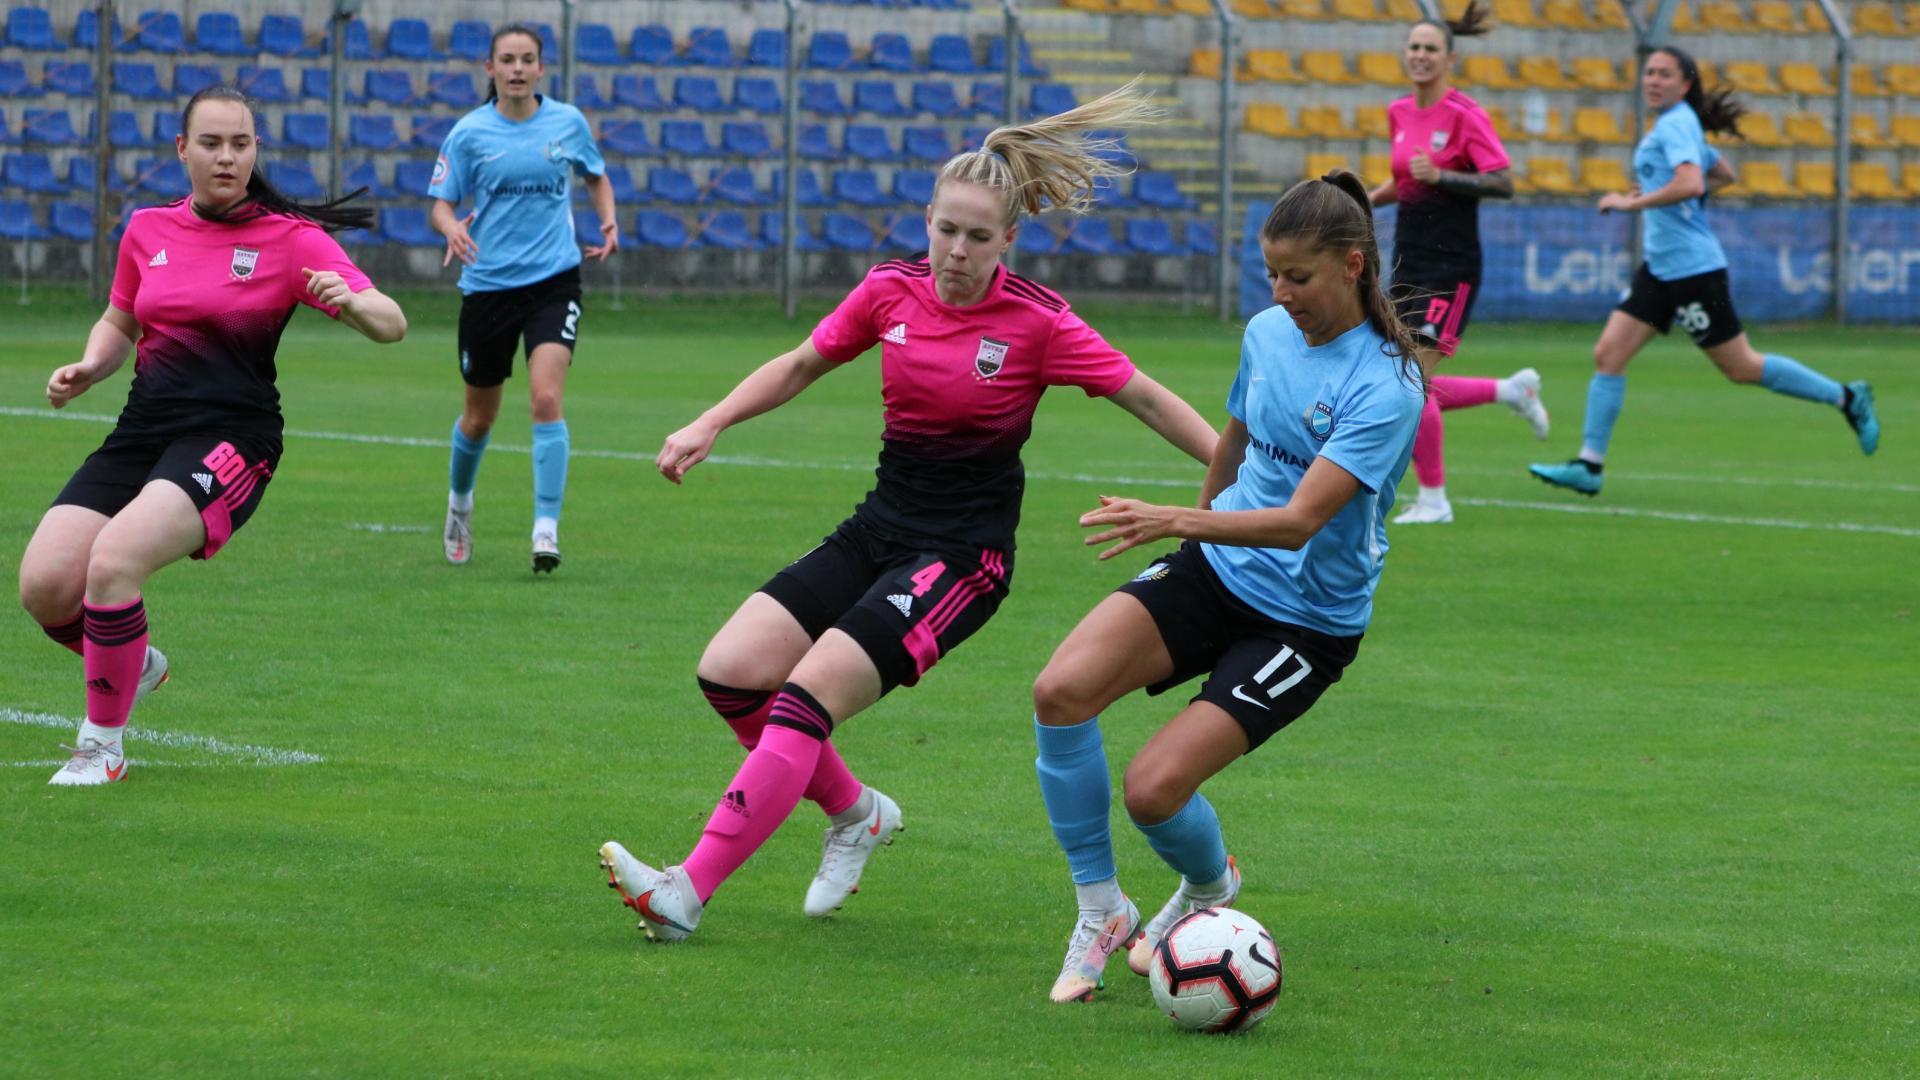 Képgaléria: MTK Hungária FC - Astra-Alef HFC-Üllő 7-0